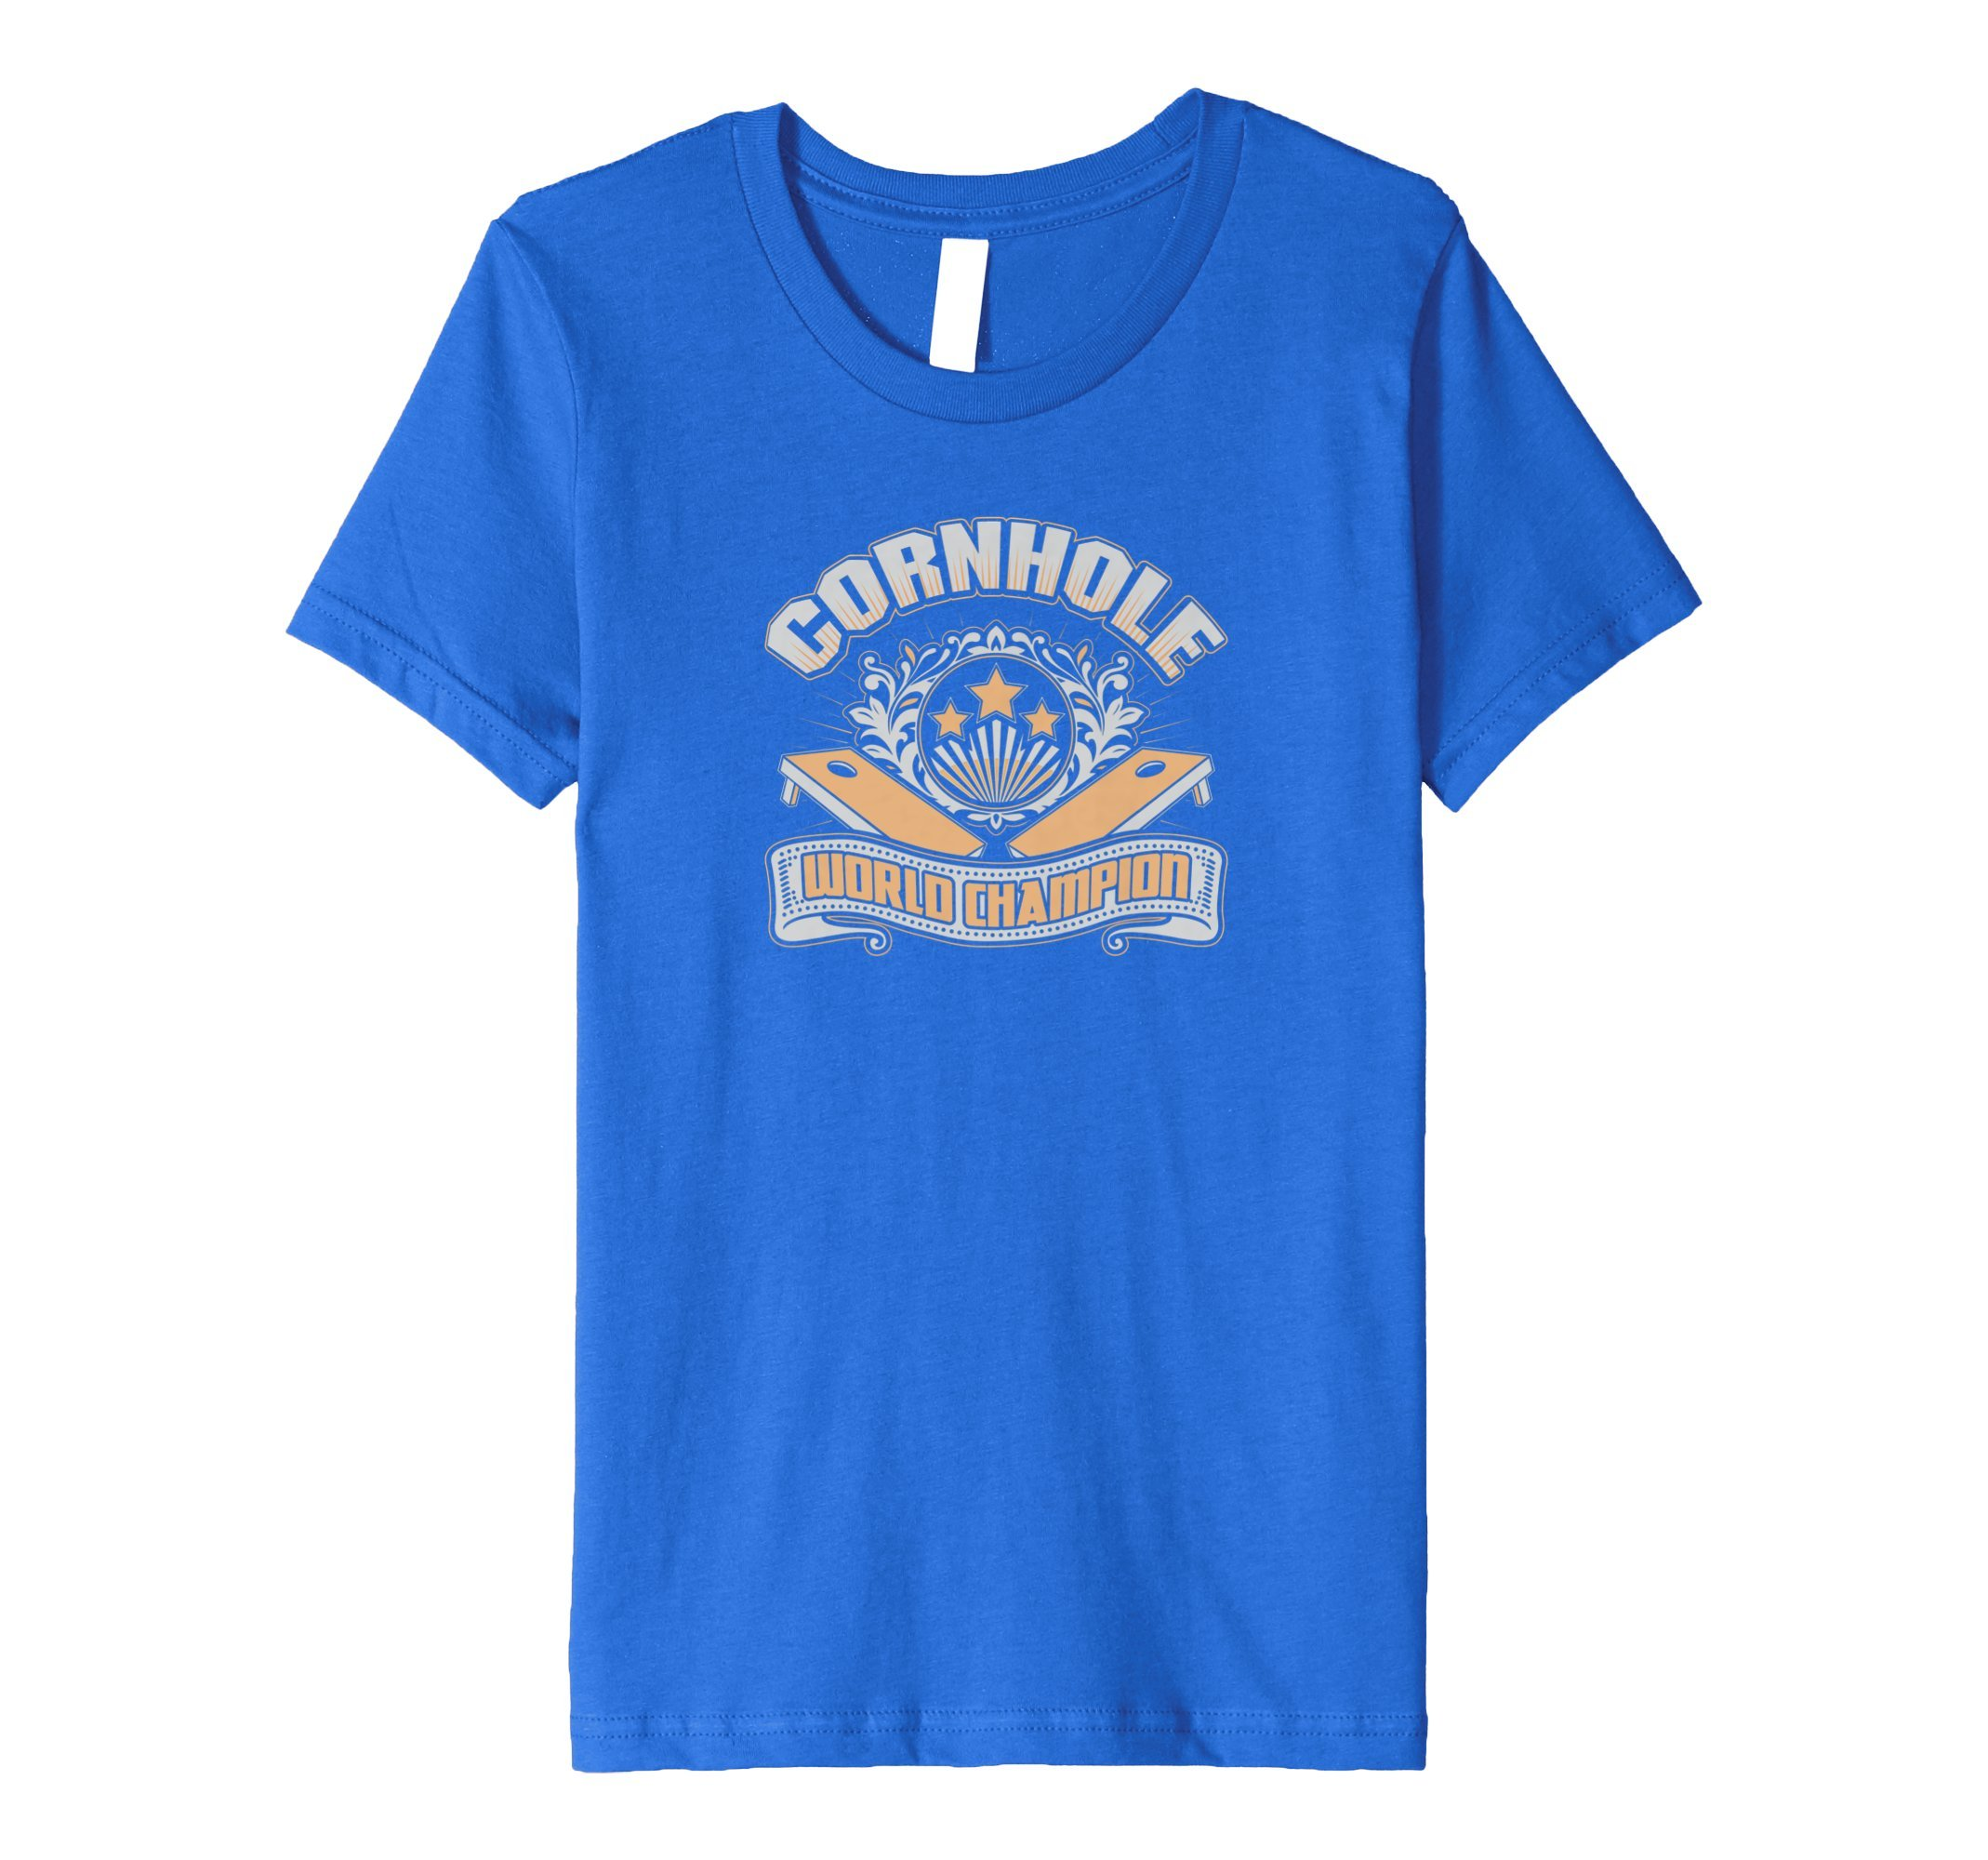 Kids Cornhole Bean Bag Toss World Champion T Shirt 10244 4 Royal Blue